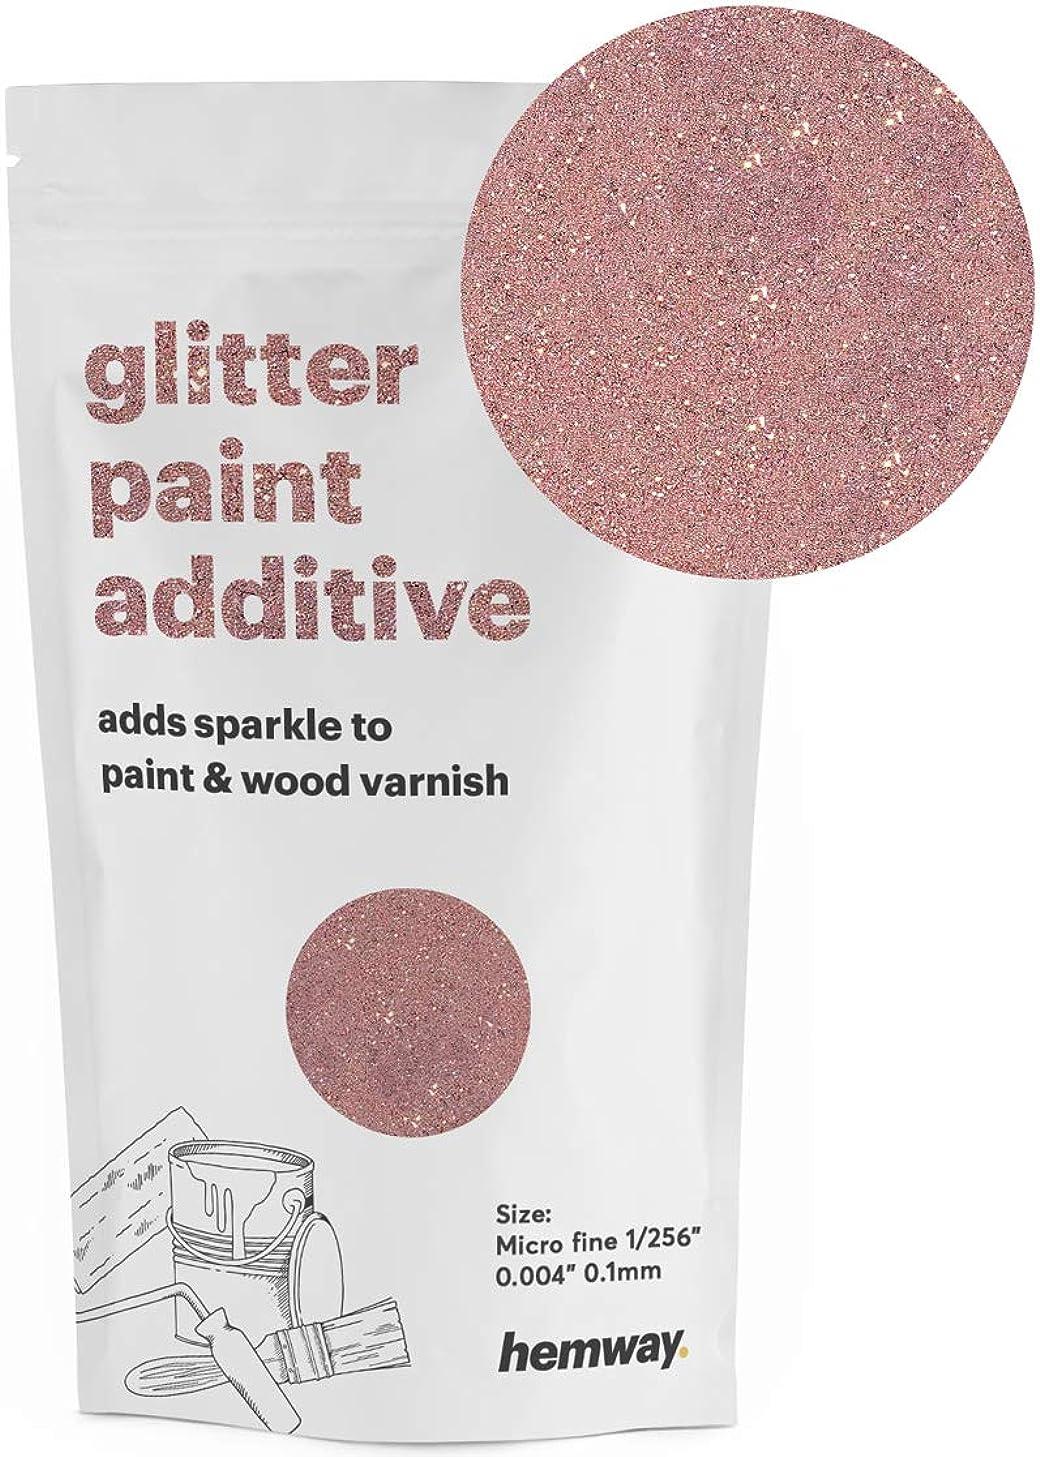 Hemway MICROFINE Glitter Paint Additive Emulsion Water Based Paints 100g (Rose Gold)